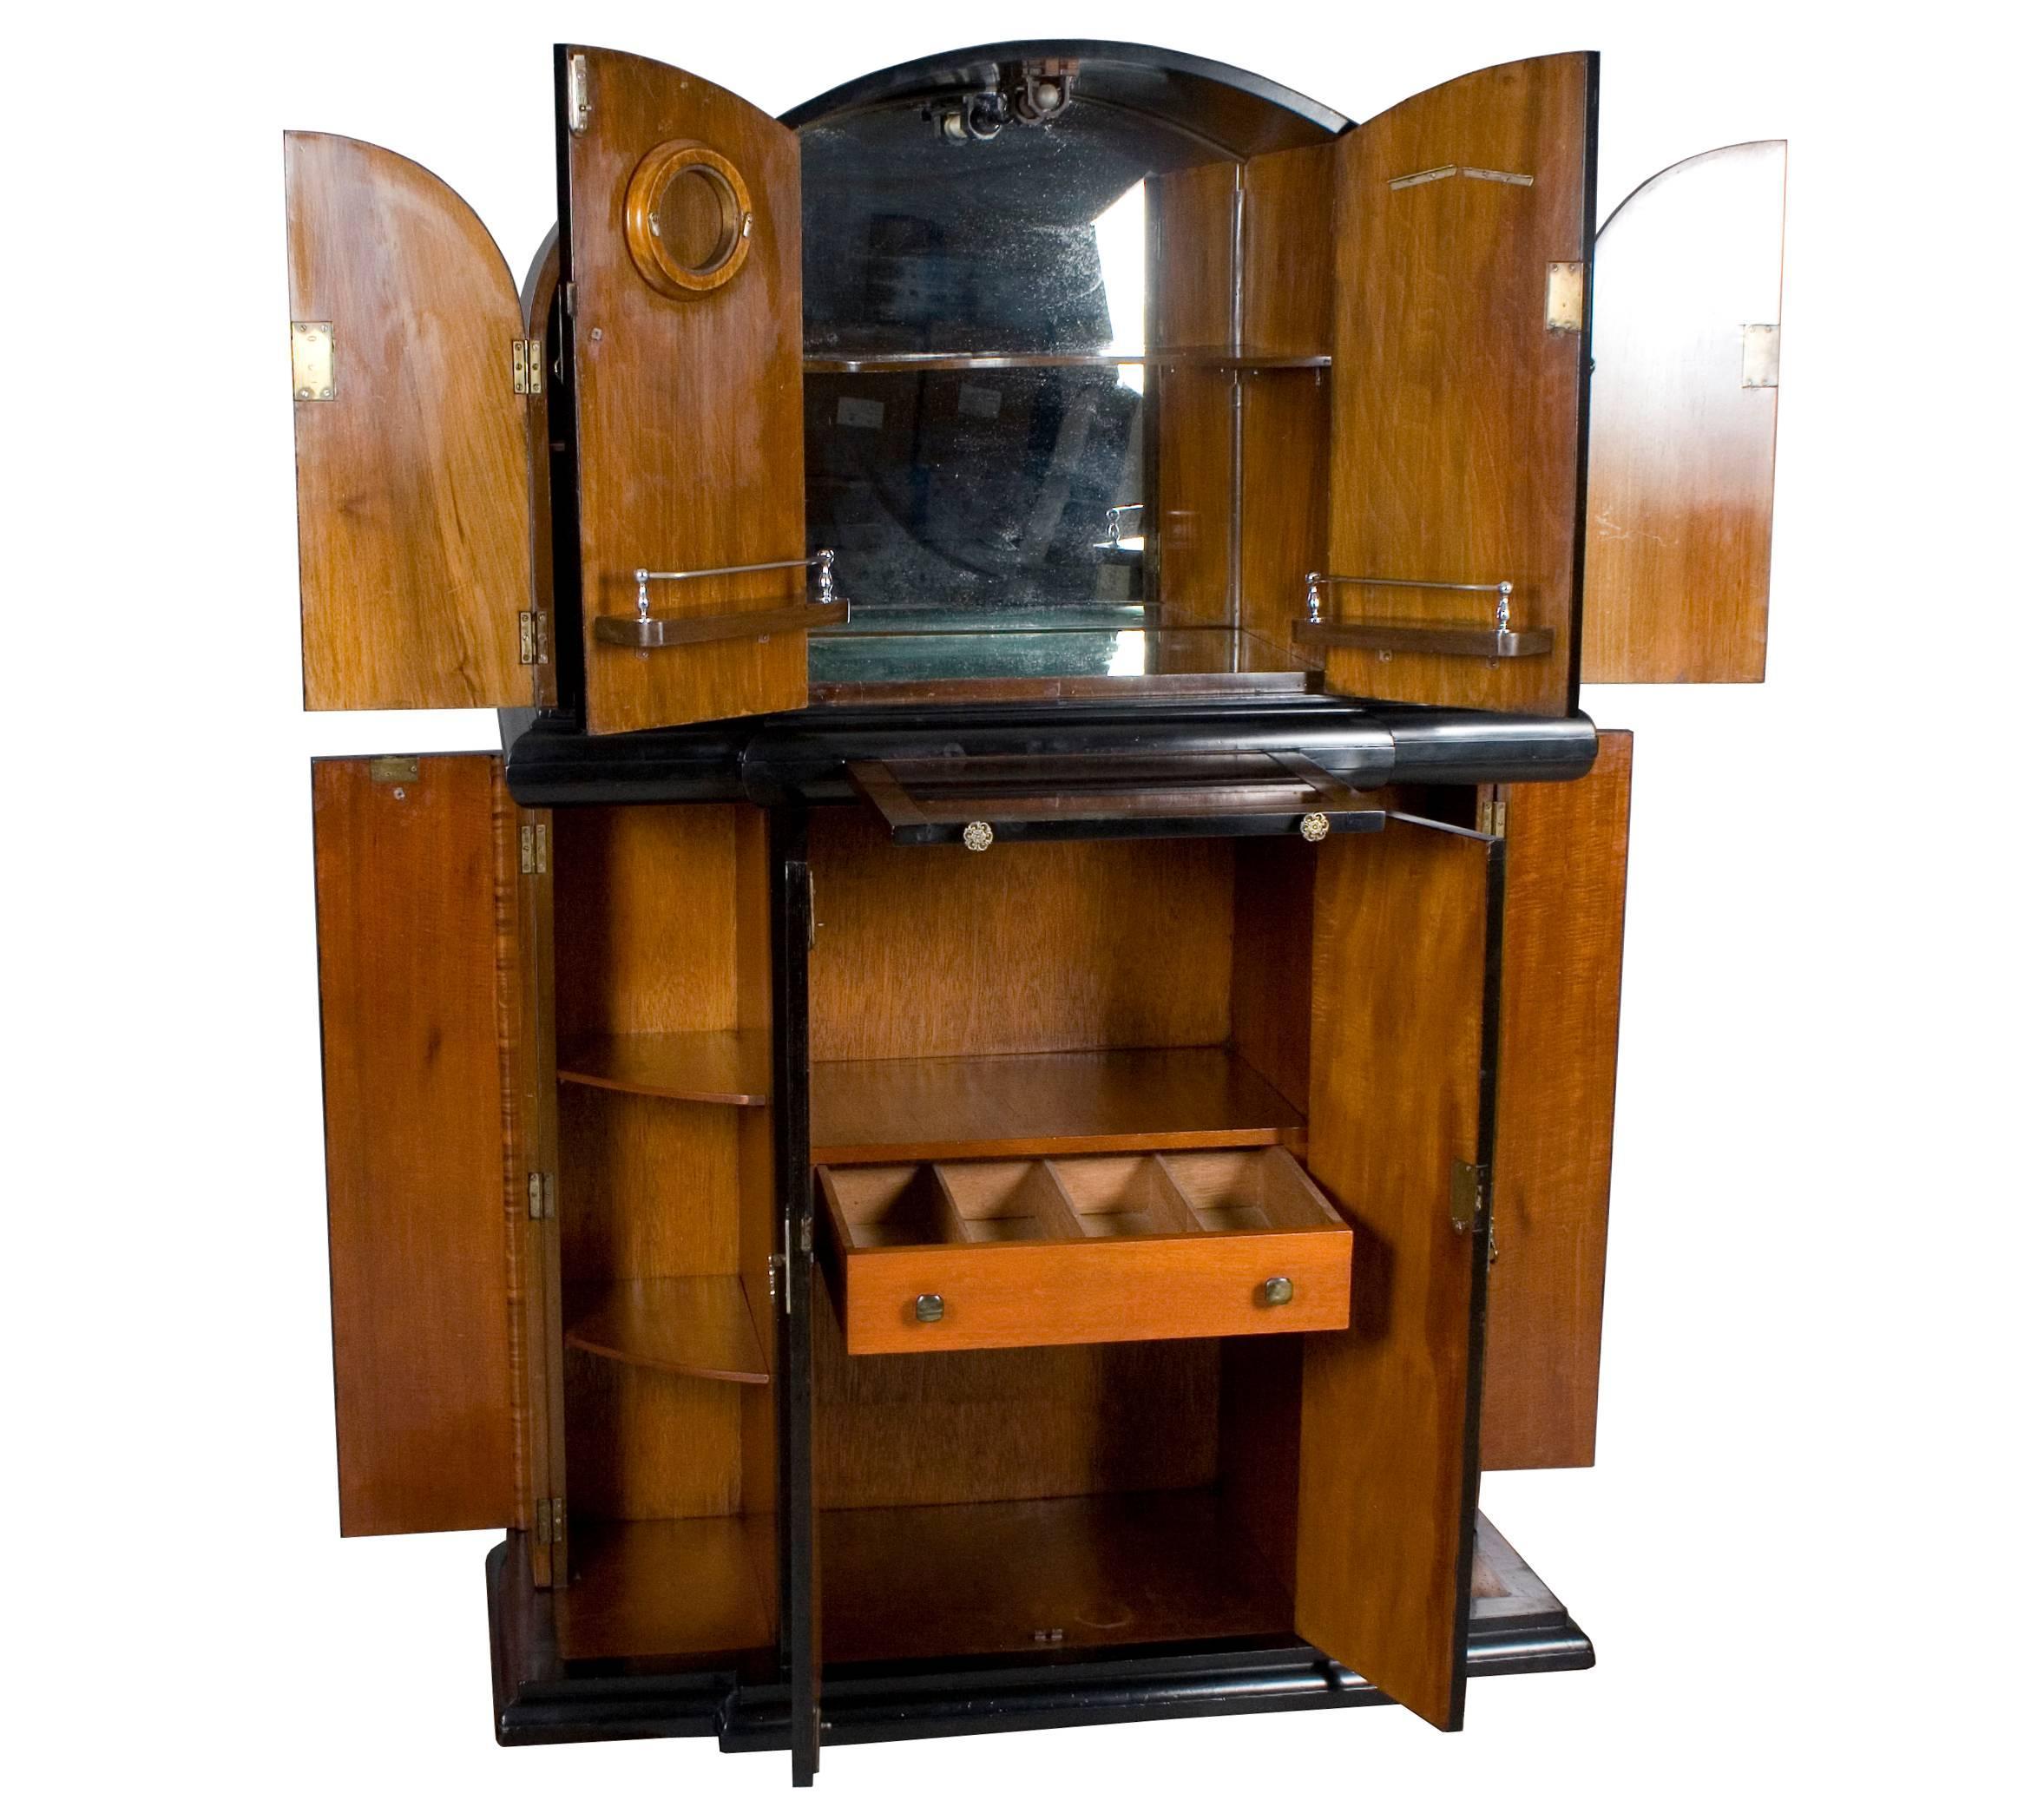 Mid 20th Century Art Deco Style Bar Liquor Cabinet For Sale